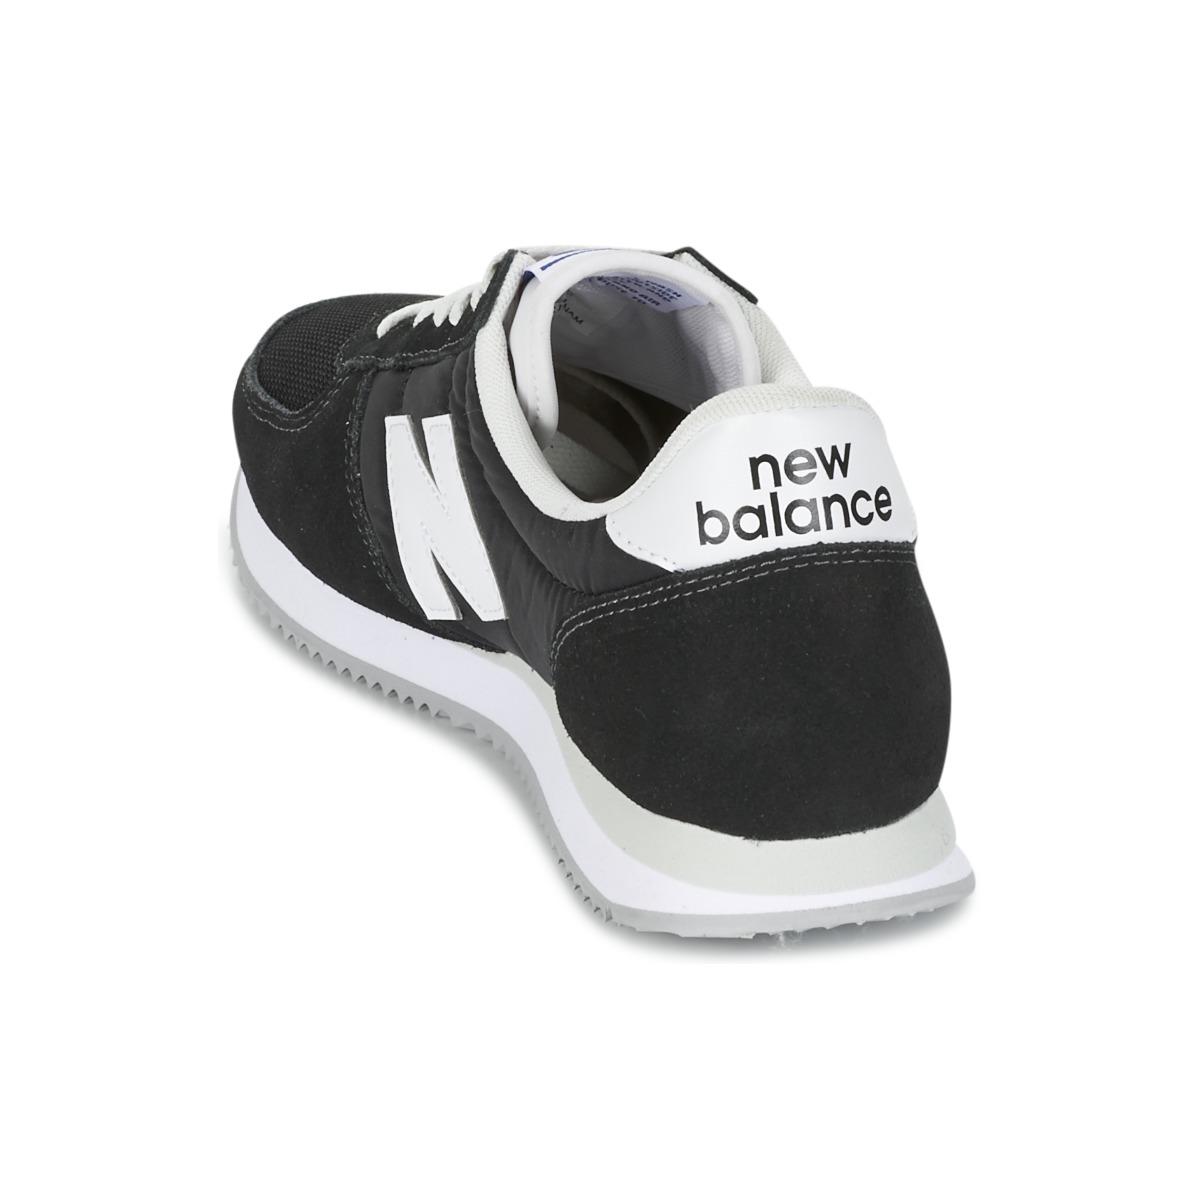 new balance u220 herren sale